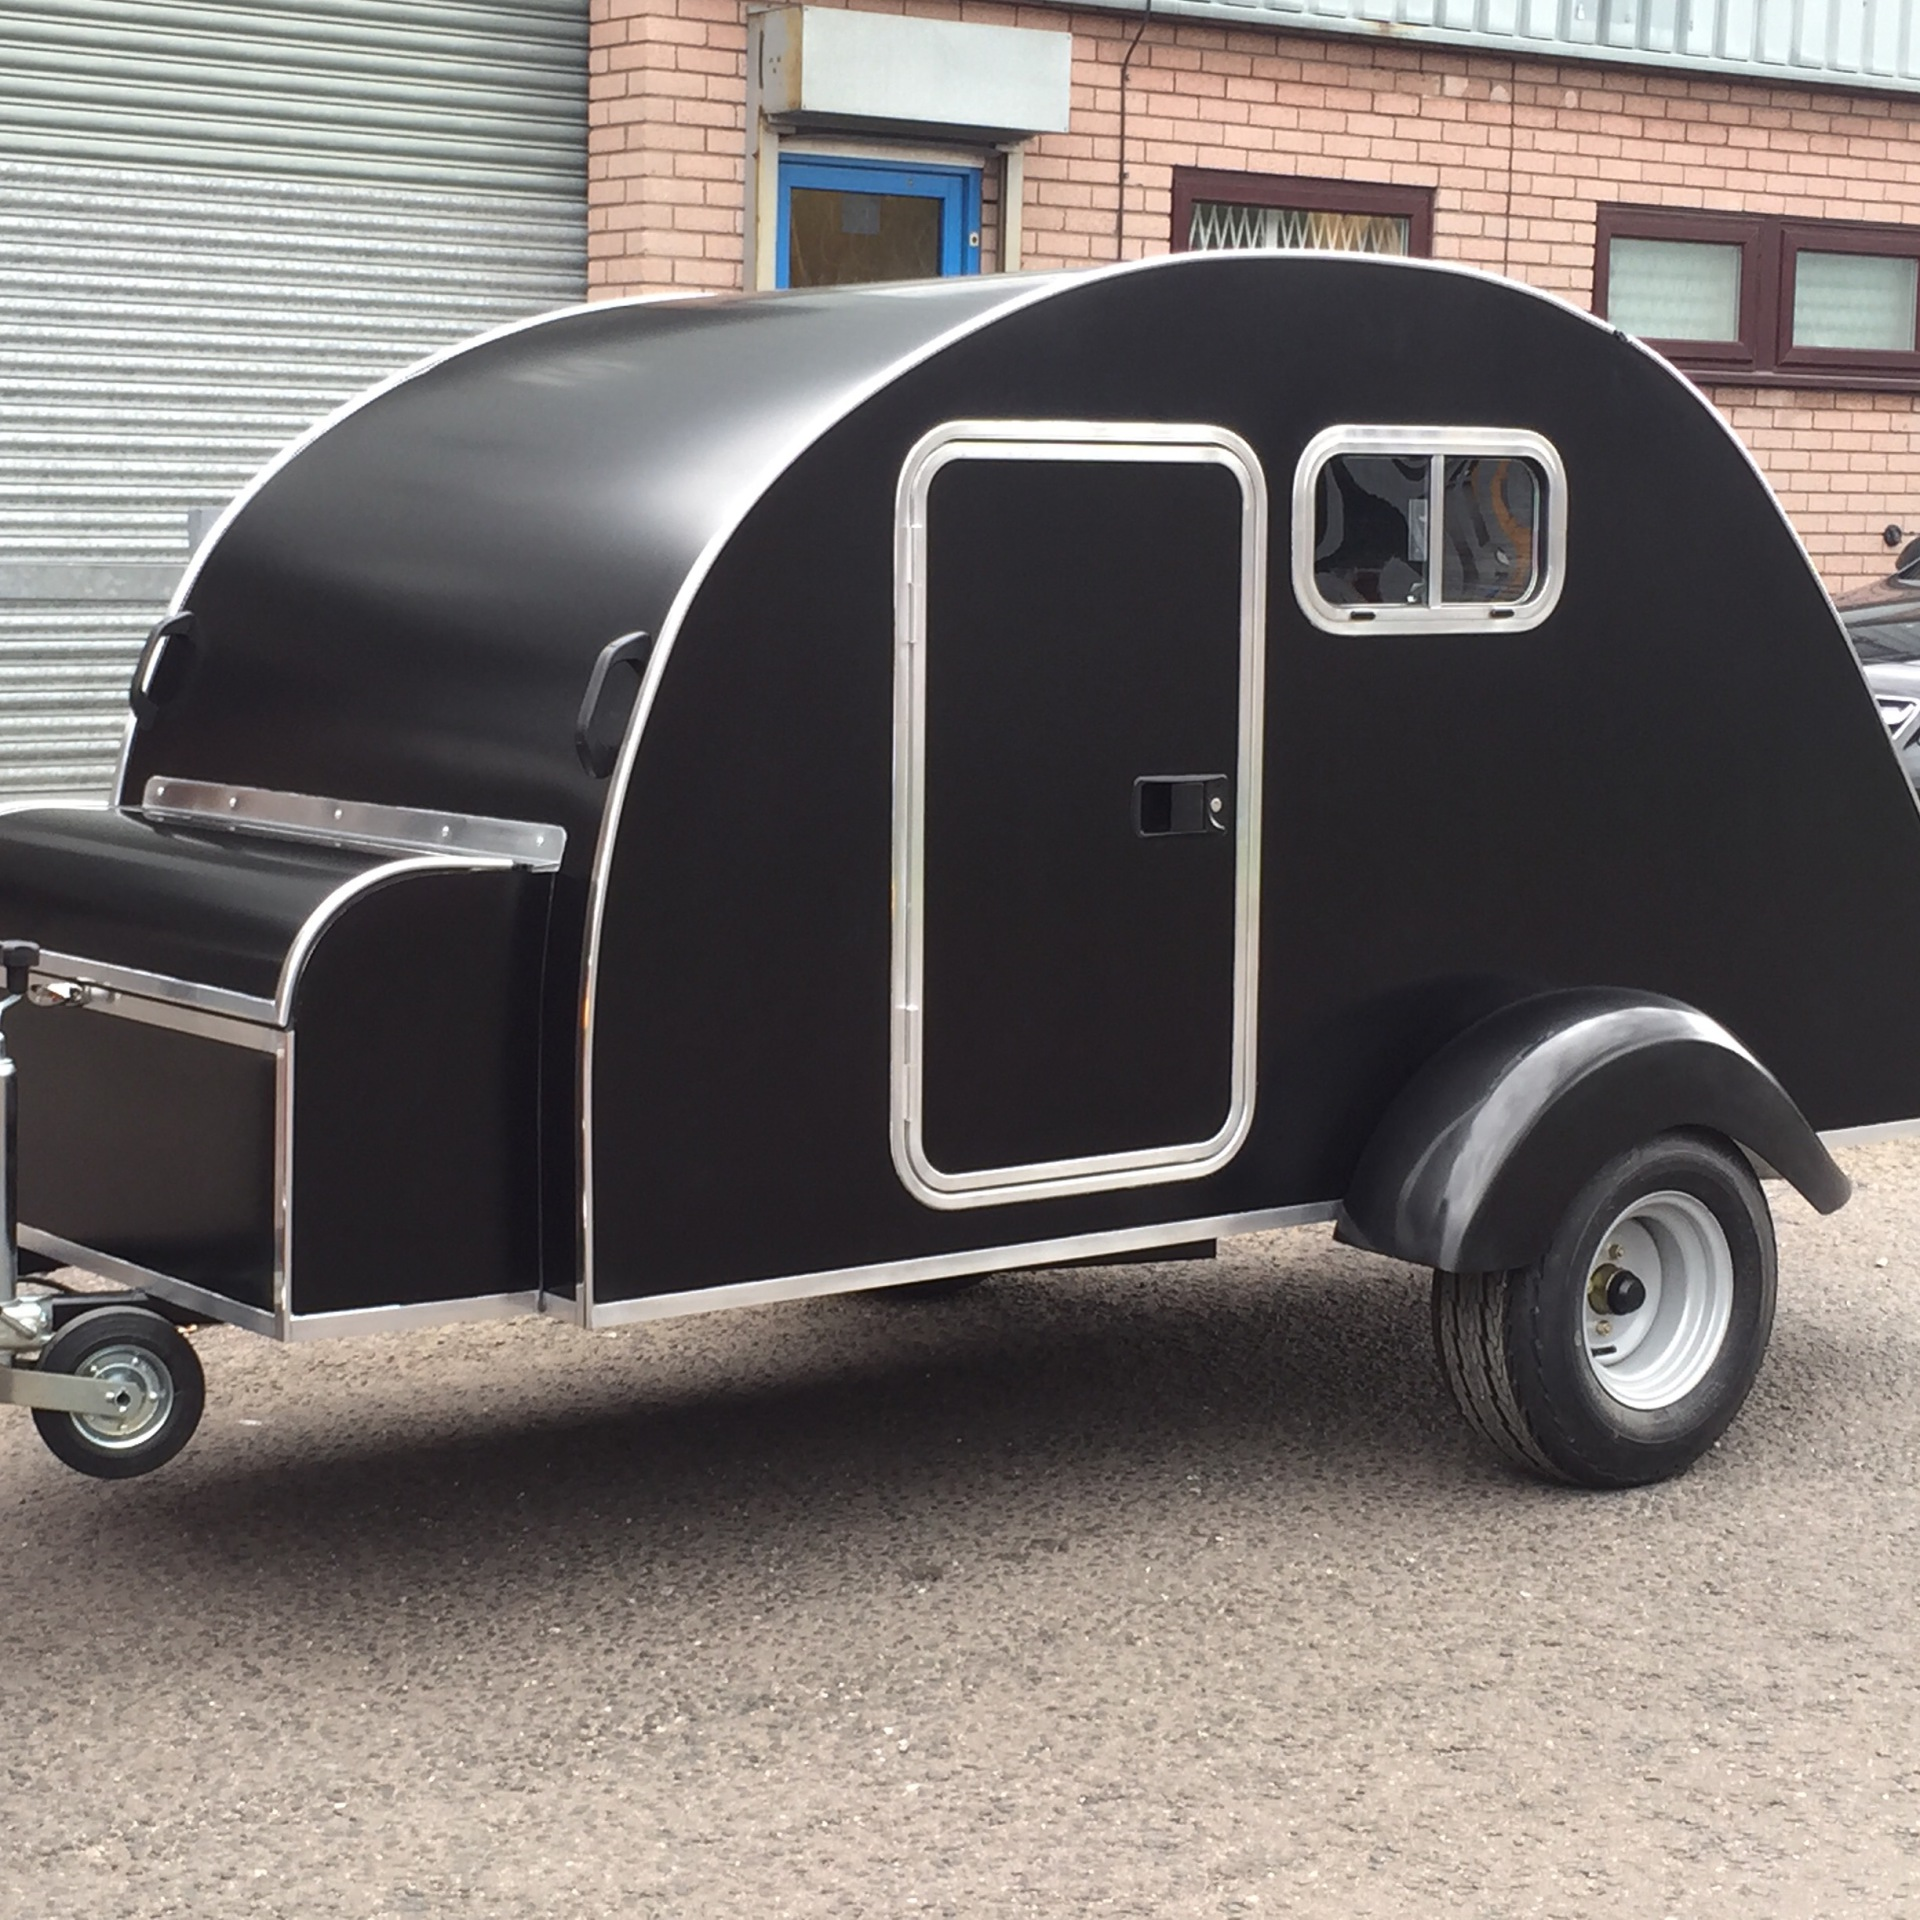 teardrop trailer, camper